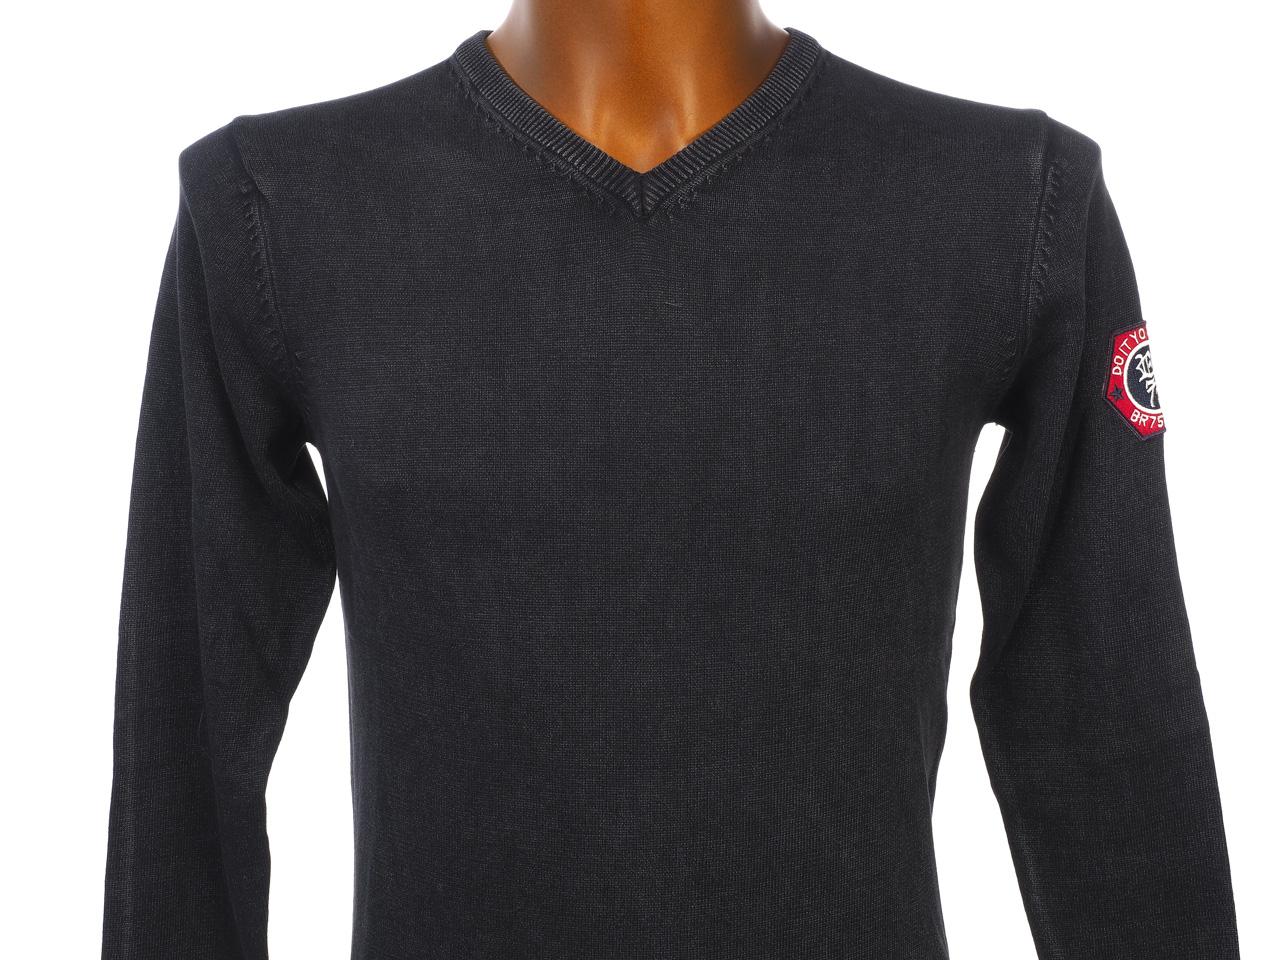 Thin-Sweater-Rivaldi-Black-Gilianu-Black-Black-Sweater-79337-New